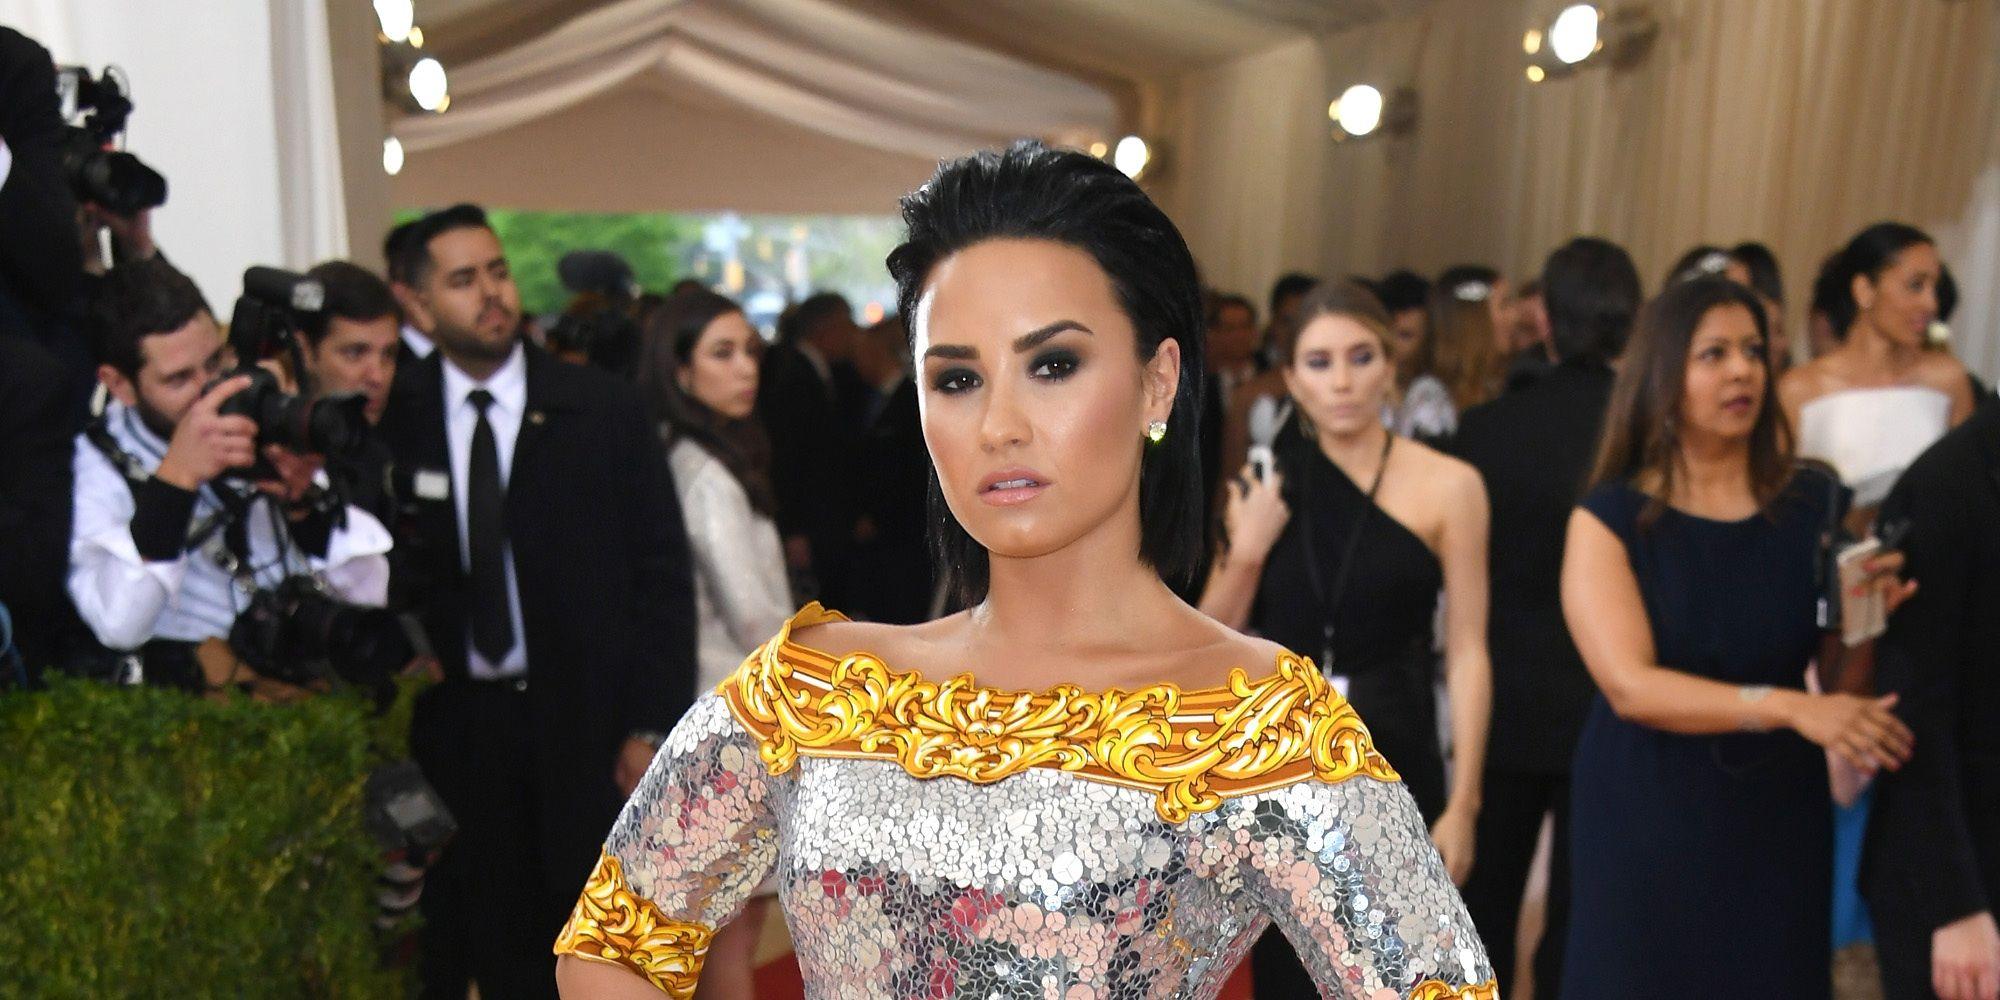 Demi Lovato at Met Gala